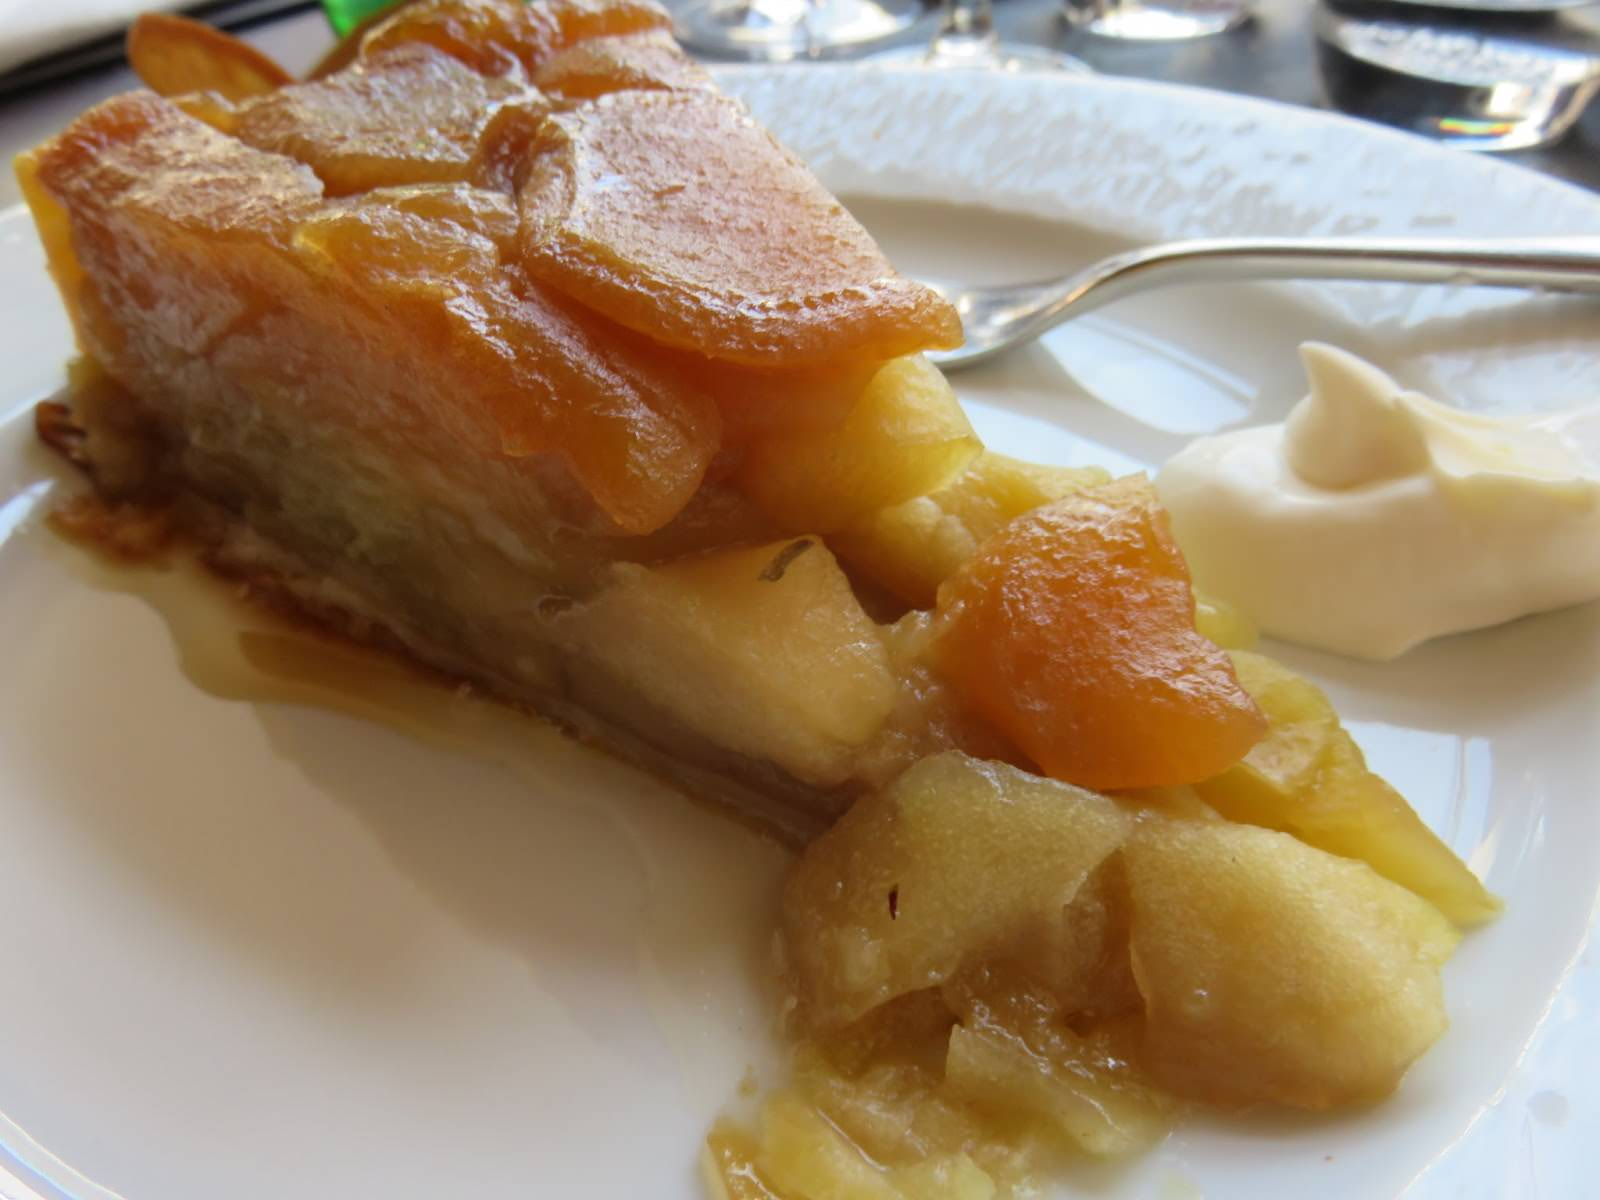 La tarte tatin, crème fraiche maison